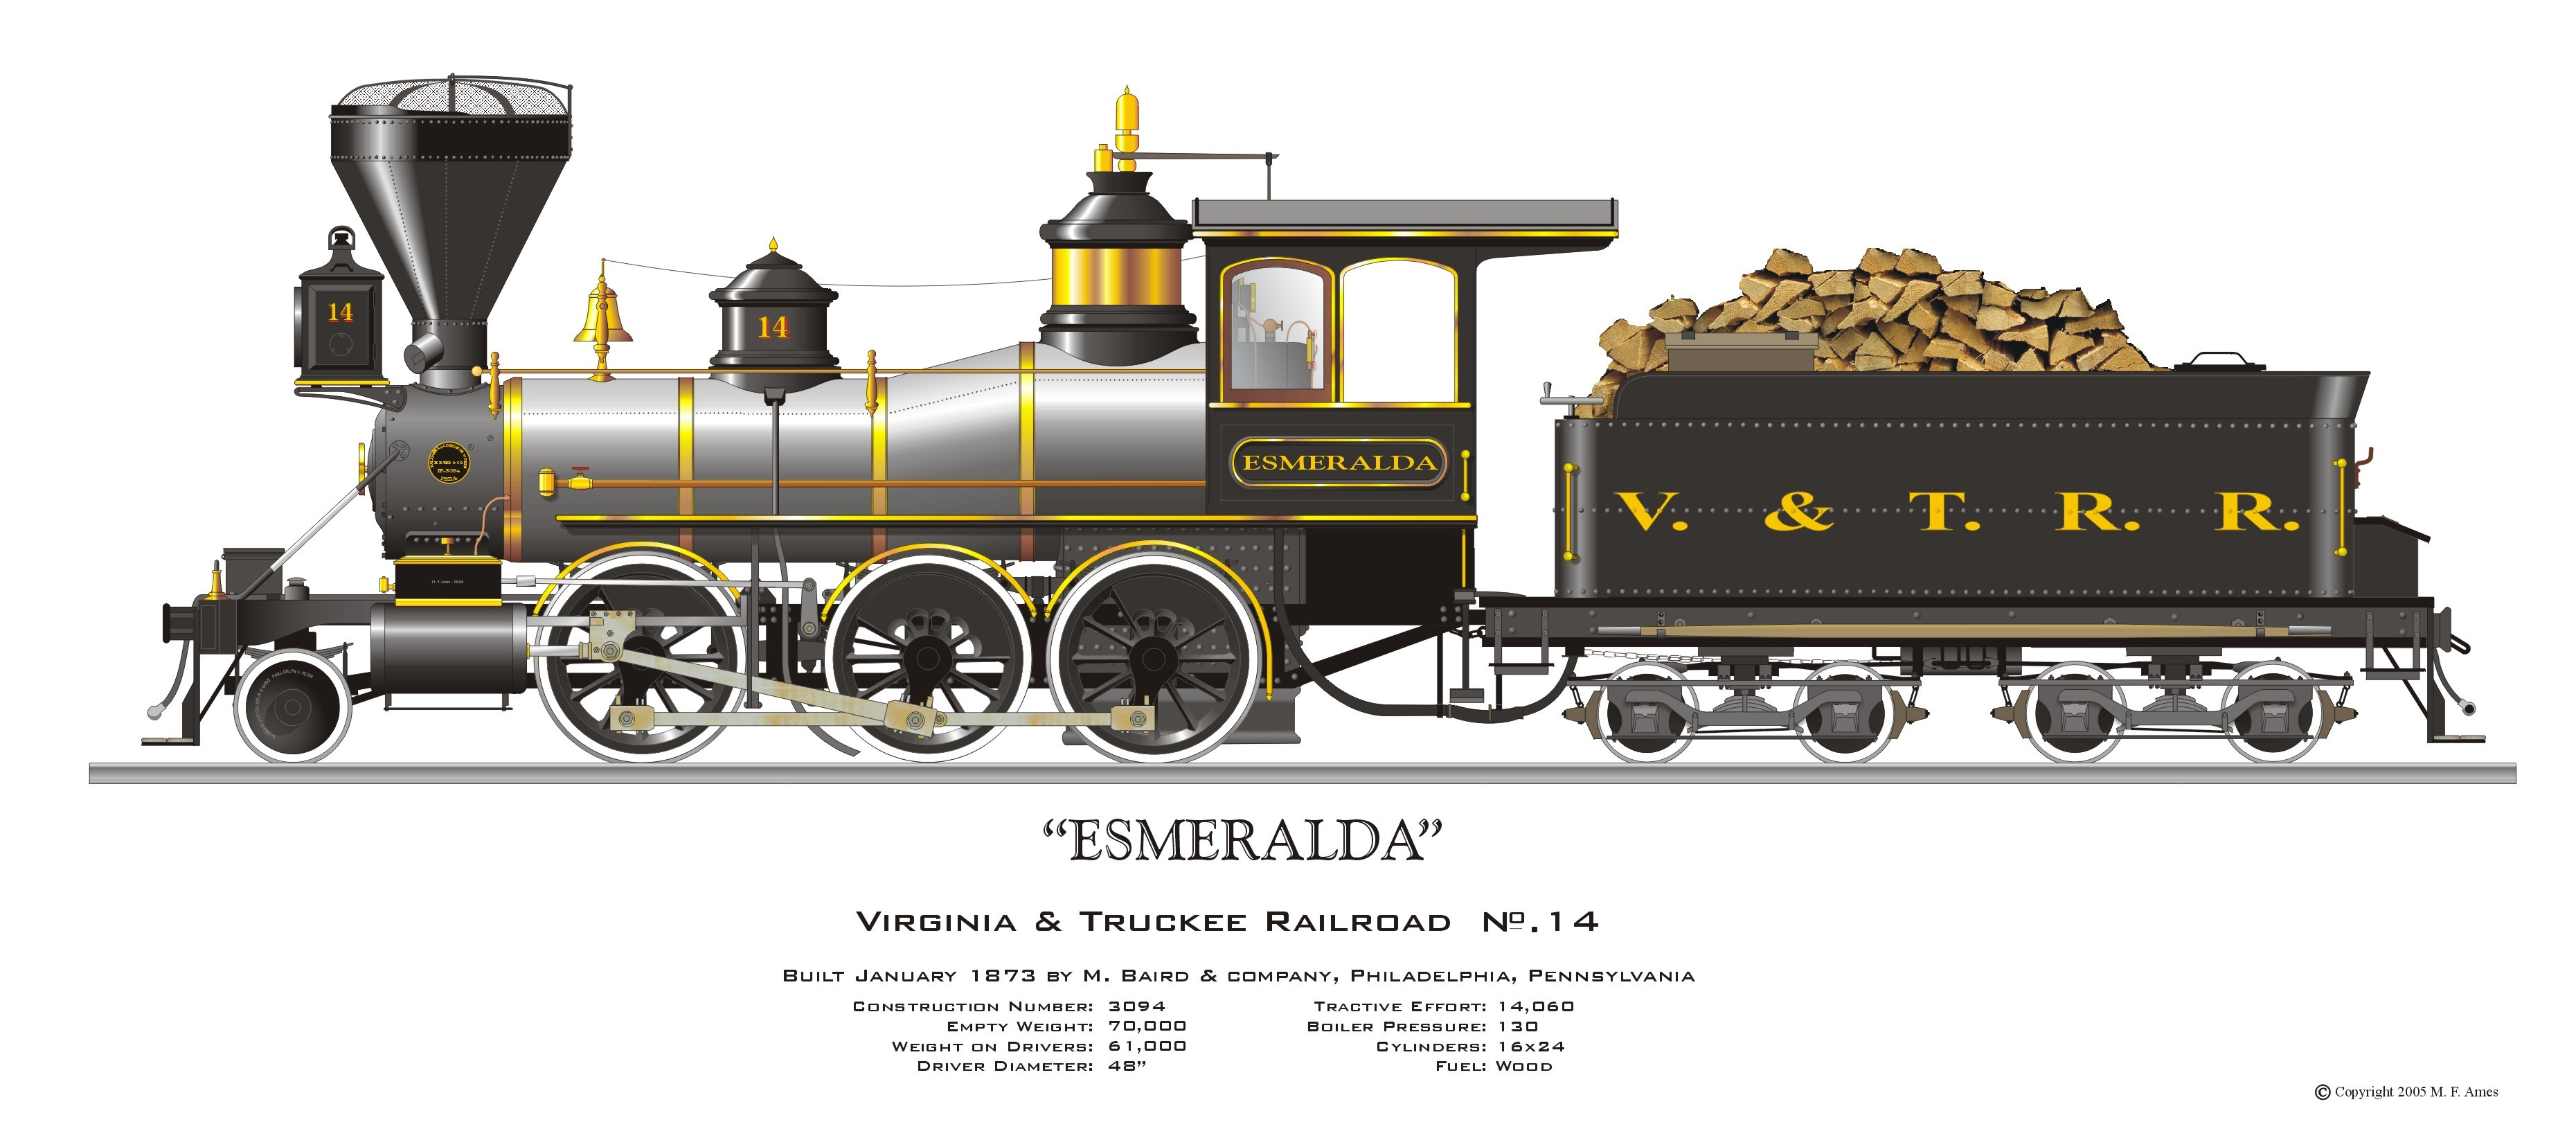 Steam Engine Locomotive Diagram Train Engine Drawing at Getdrawings Of Steam Engine Locomotive Diagram